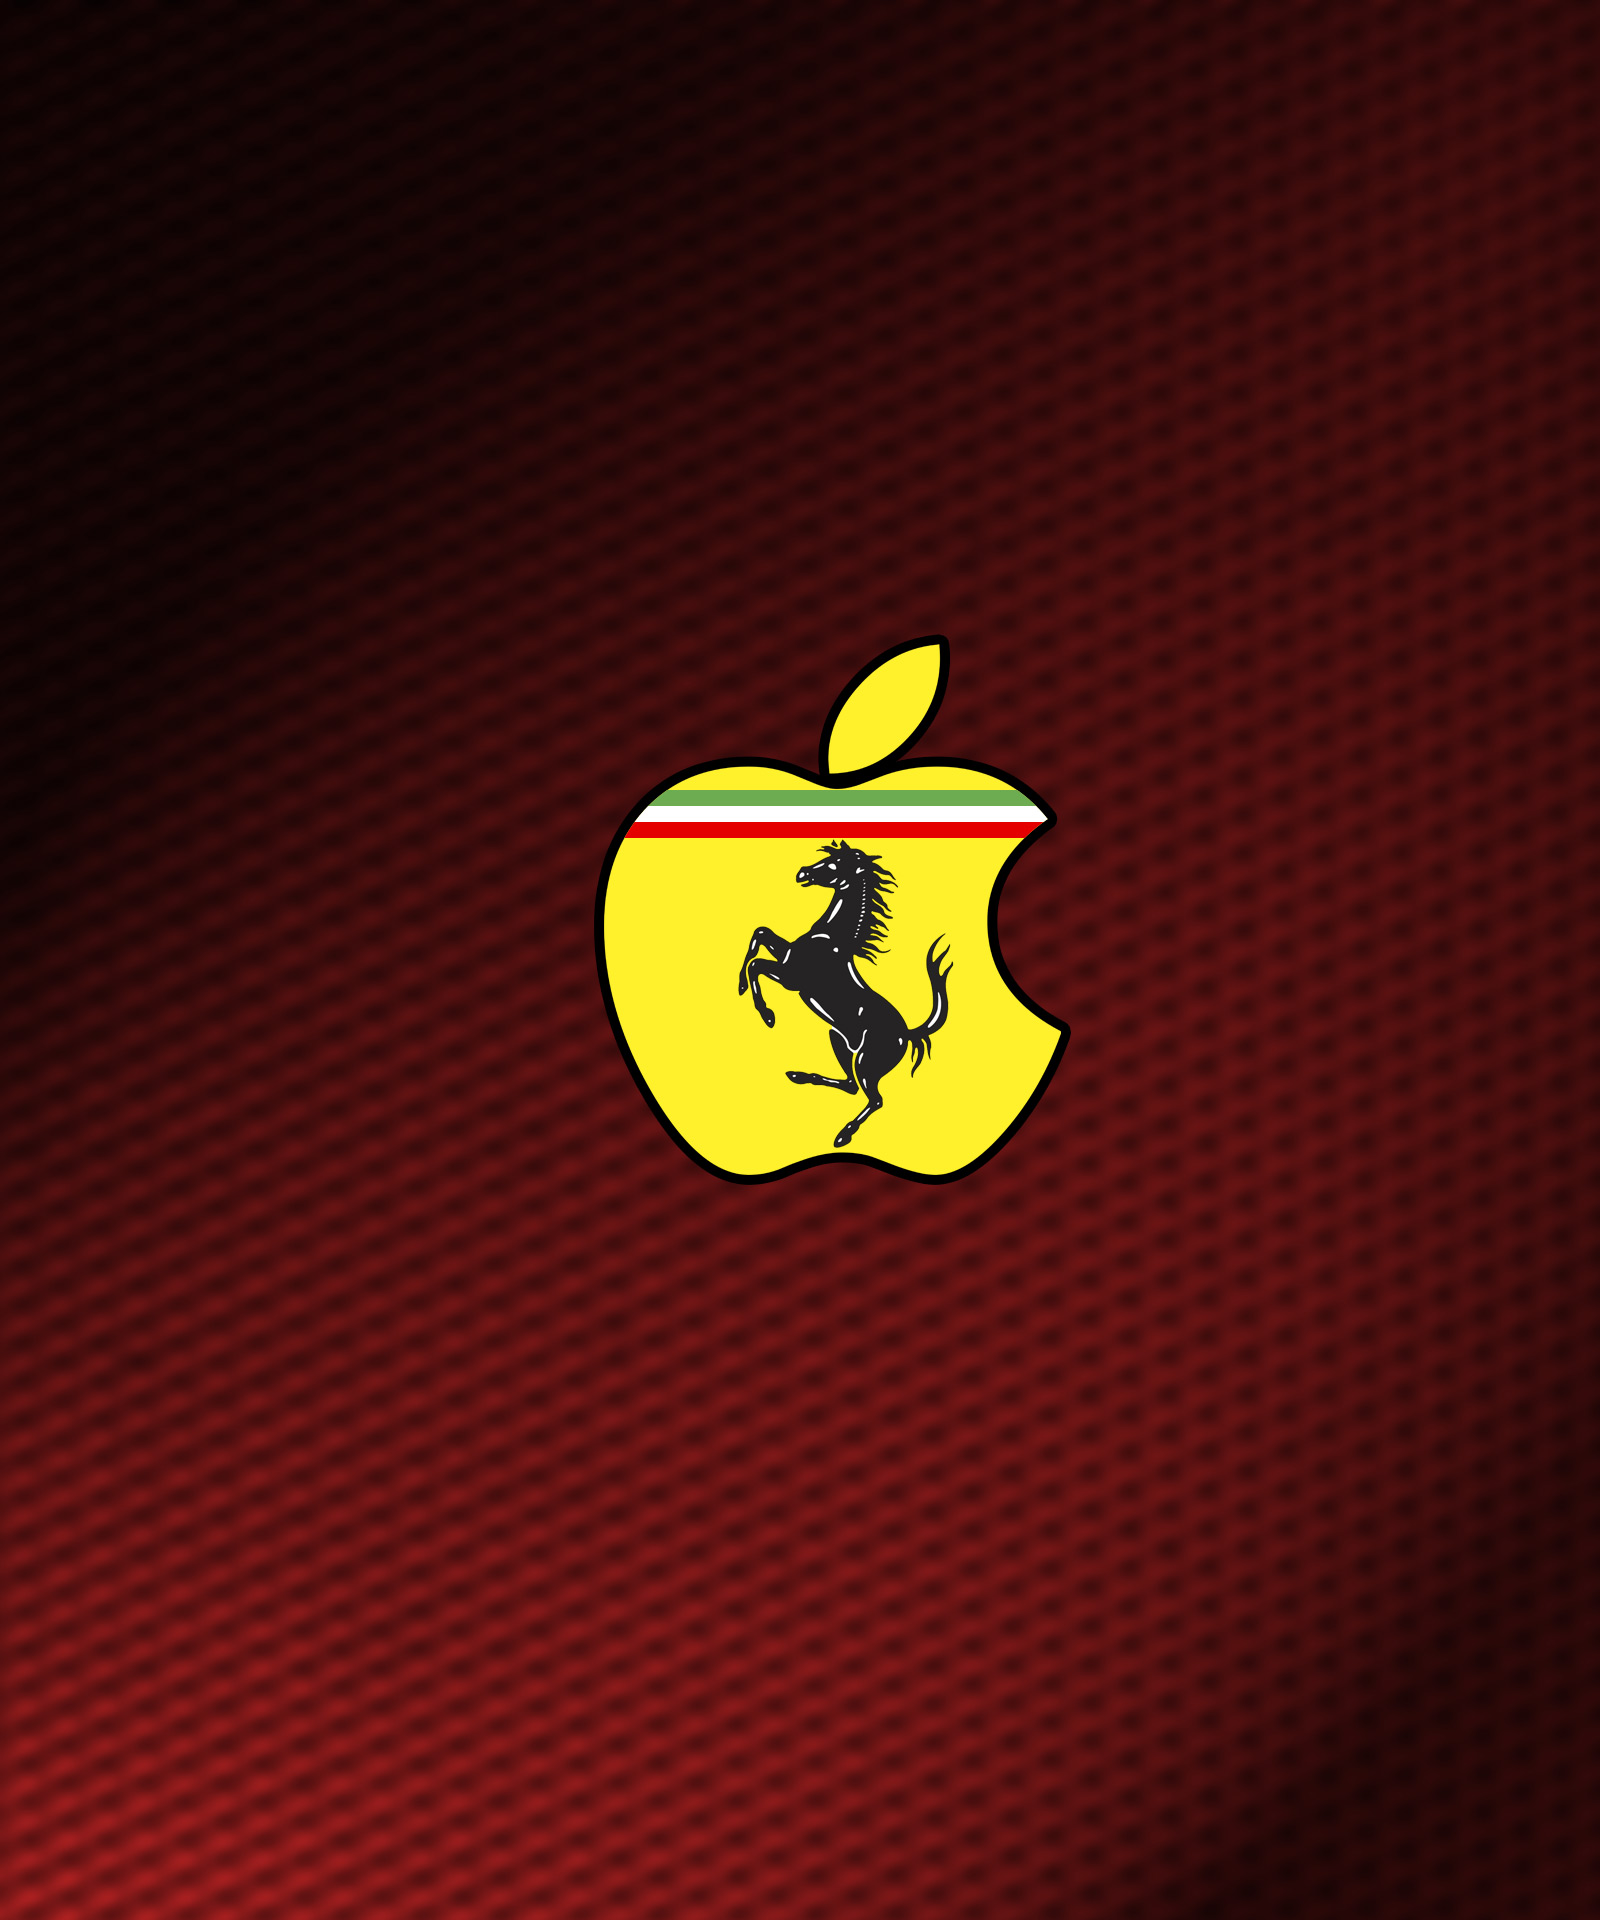 Apple Splash Wallpaper for iPhone 1600x1920